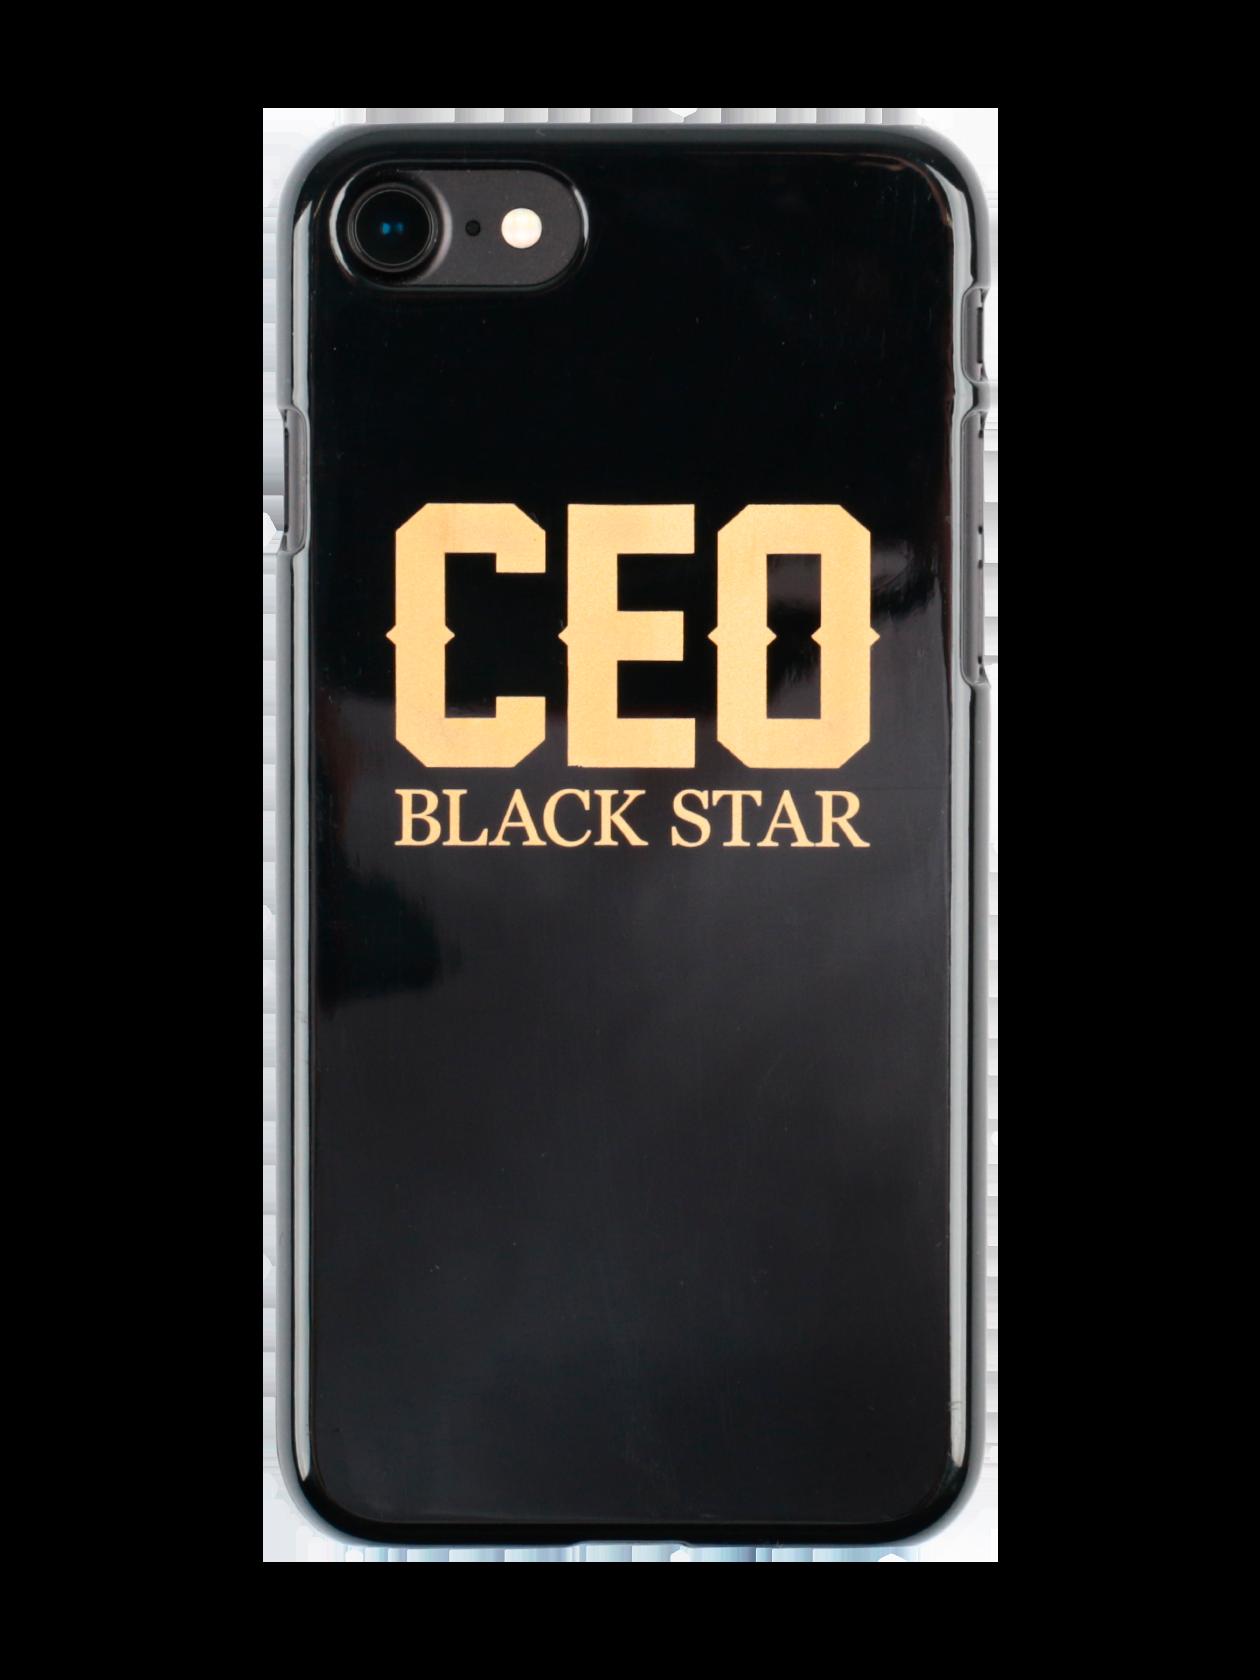 Чехол для телефона ROYALTY CEO<br><br>Размер: 7+<br>Цвет: Черный<br>Пол: Унисекс